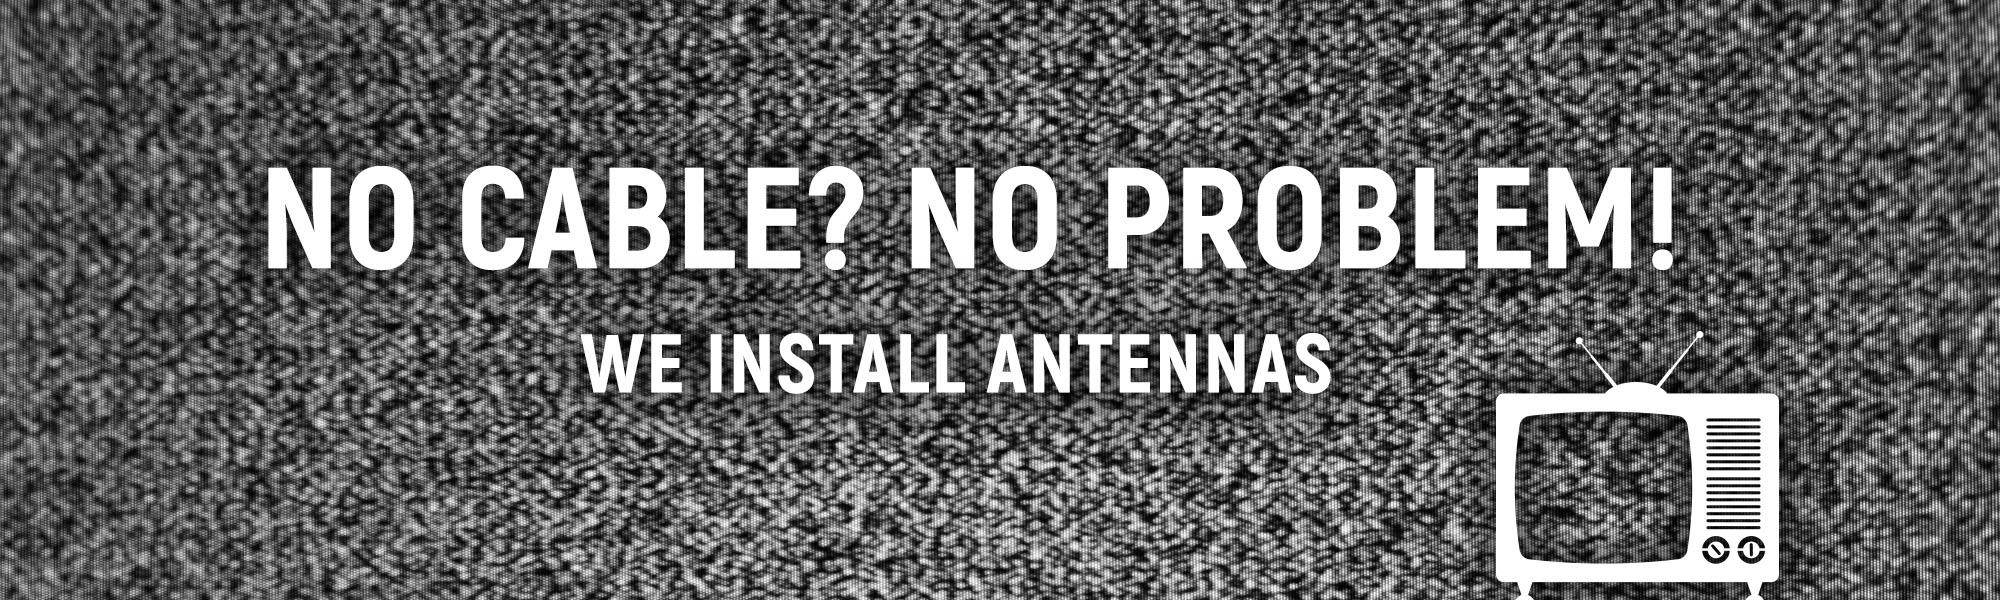 We install antennas